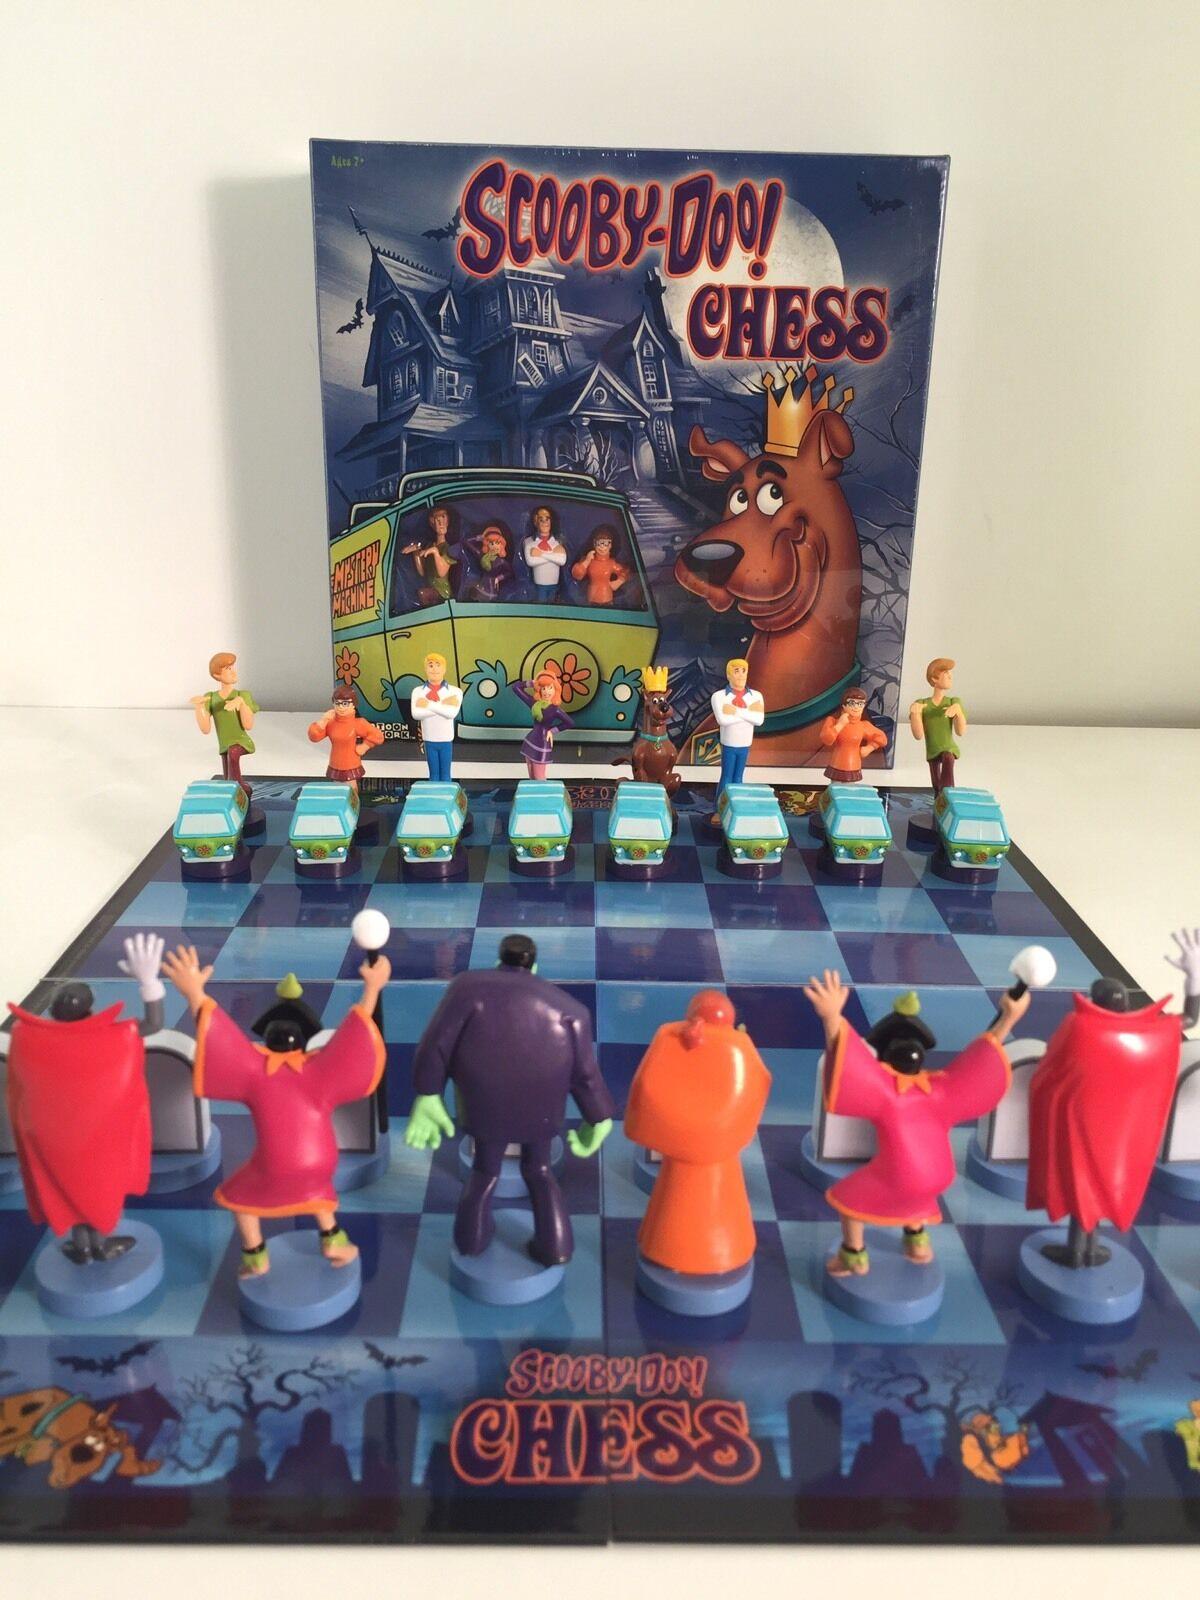 Scooby-Doo chess set (6) jeu de lots. RARE, NEUF, & sealed